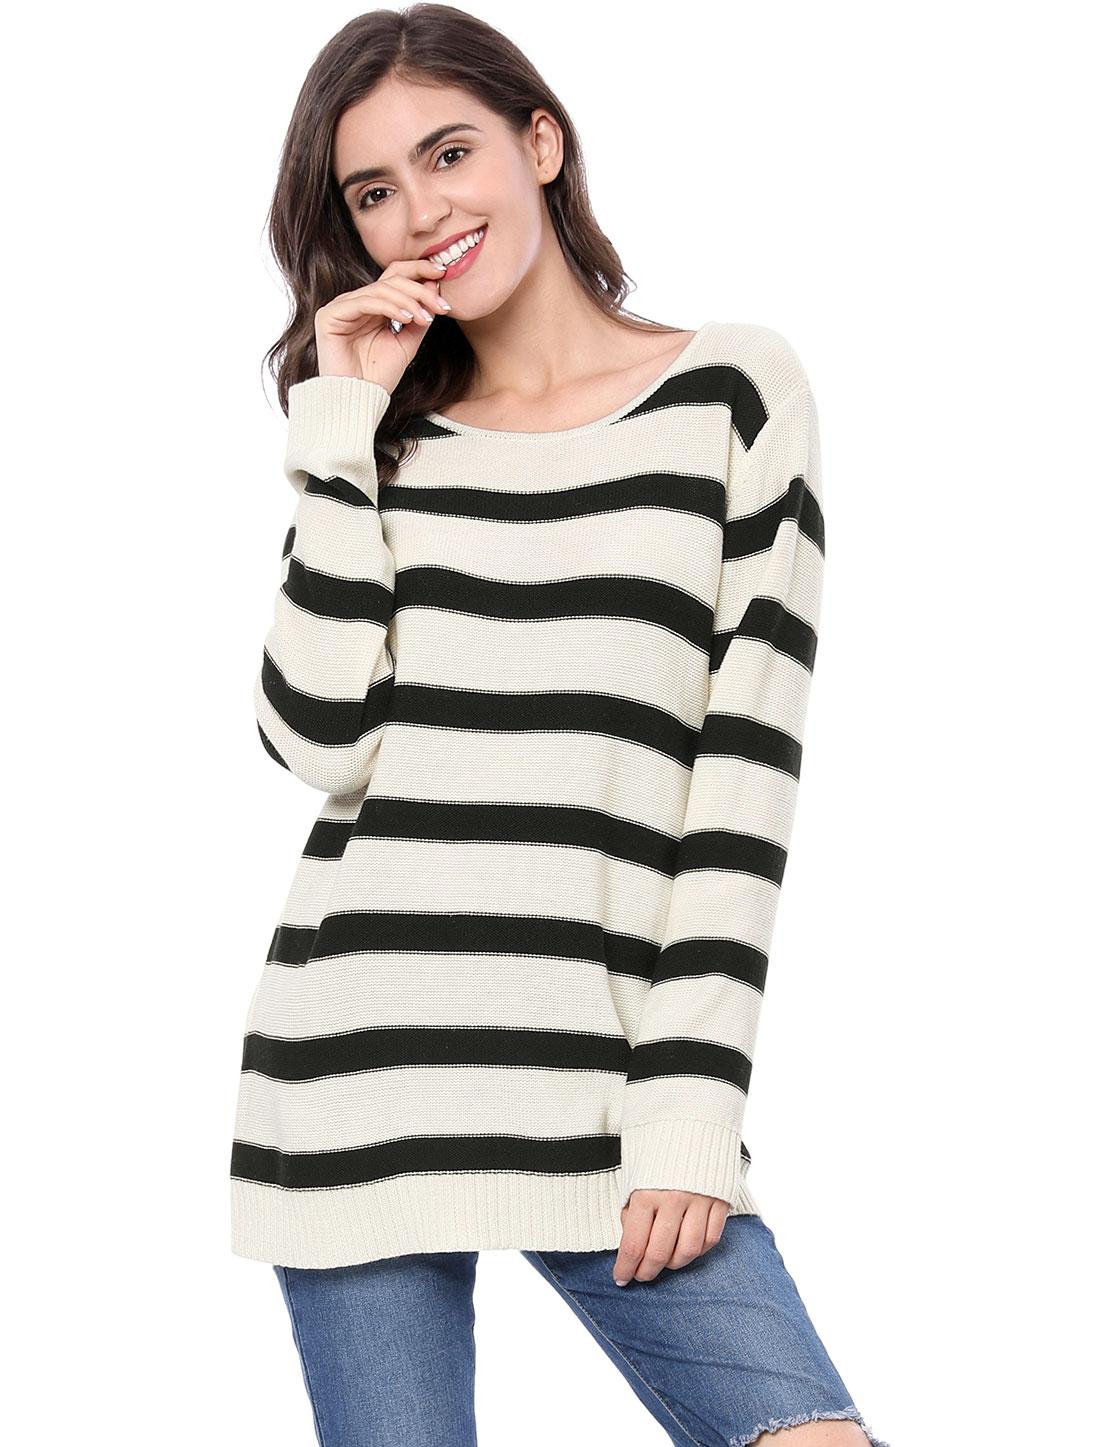 Allegra K Women Long Sleeves Drop Shoulder Loose Striped Sweater White S